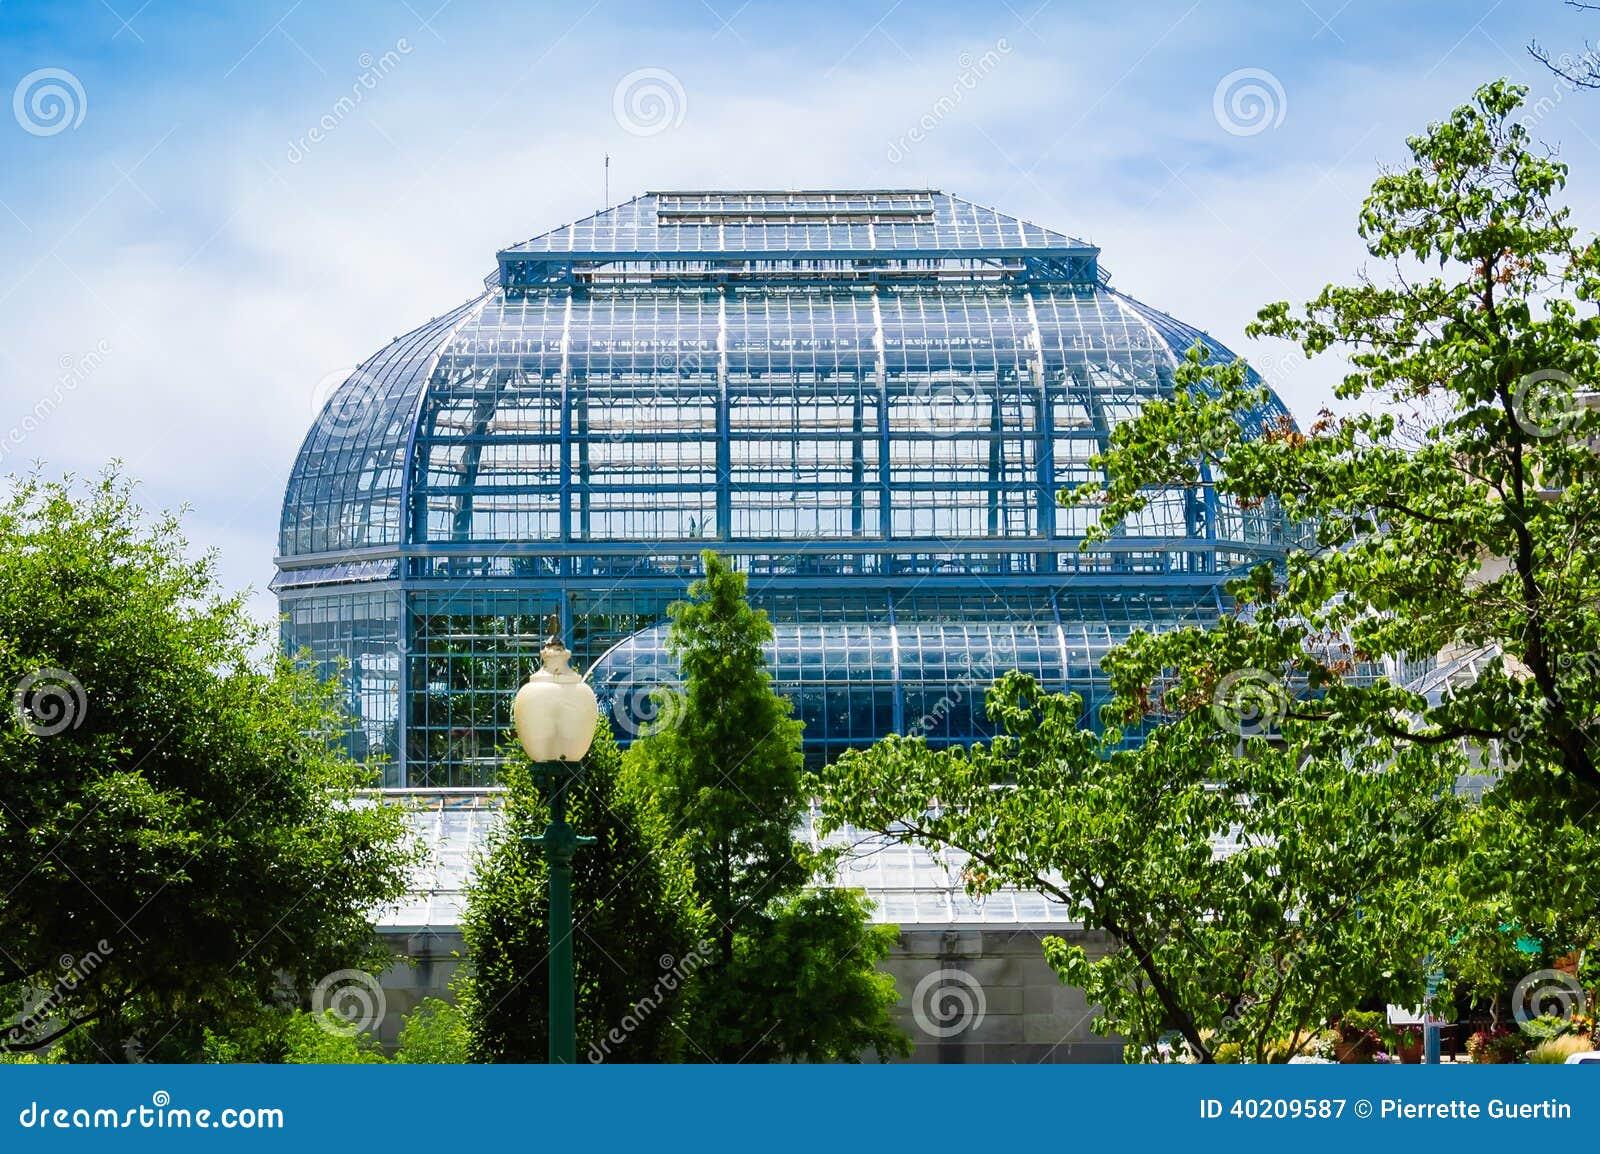 National Botanical Gardens Dc National Botanic Gardens Washington Dc Visions Of Travel